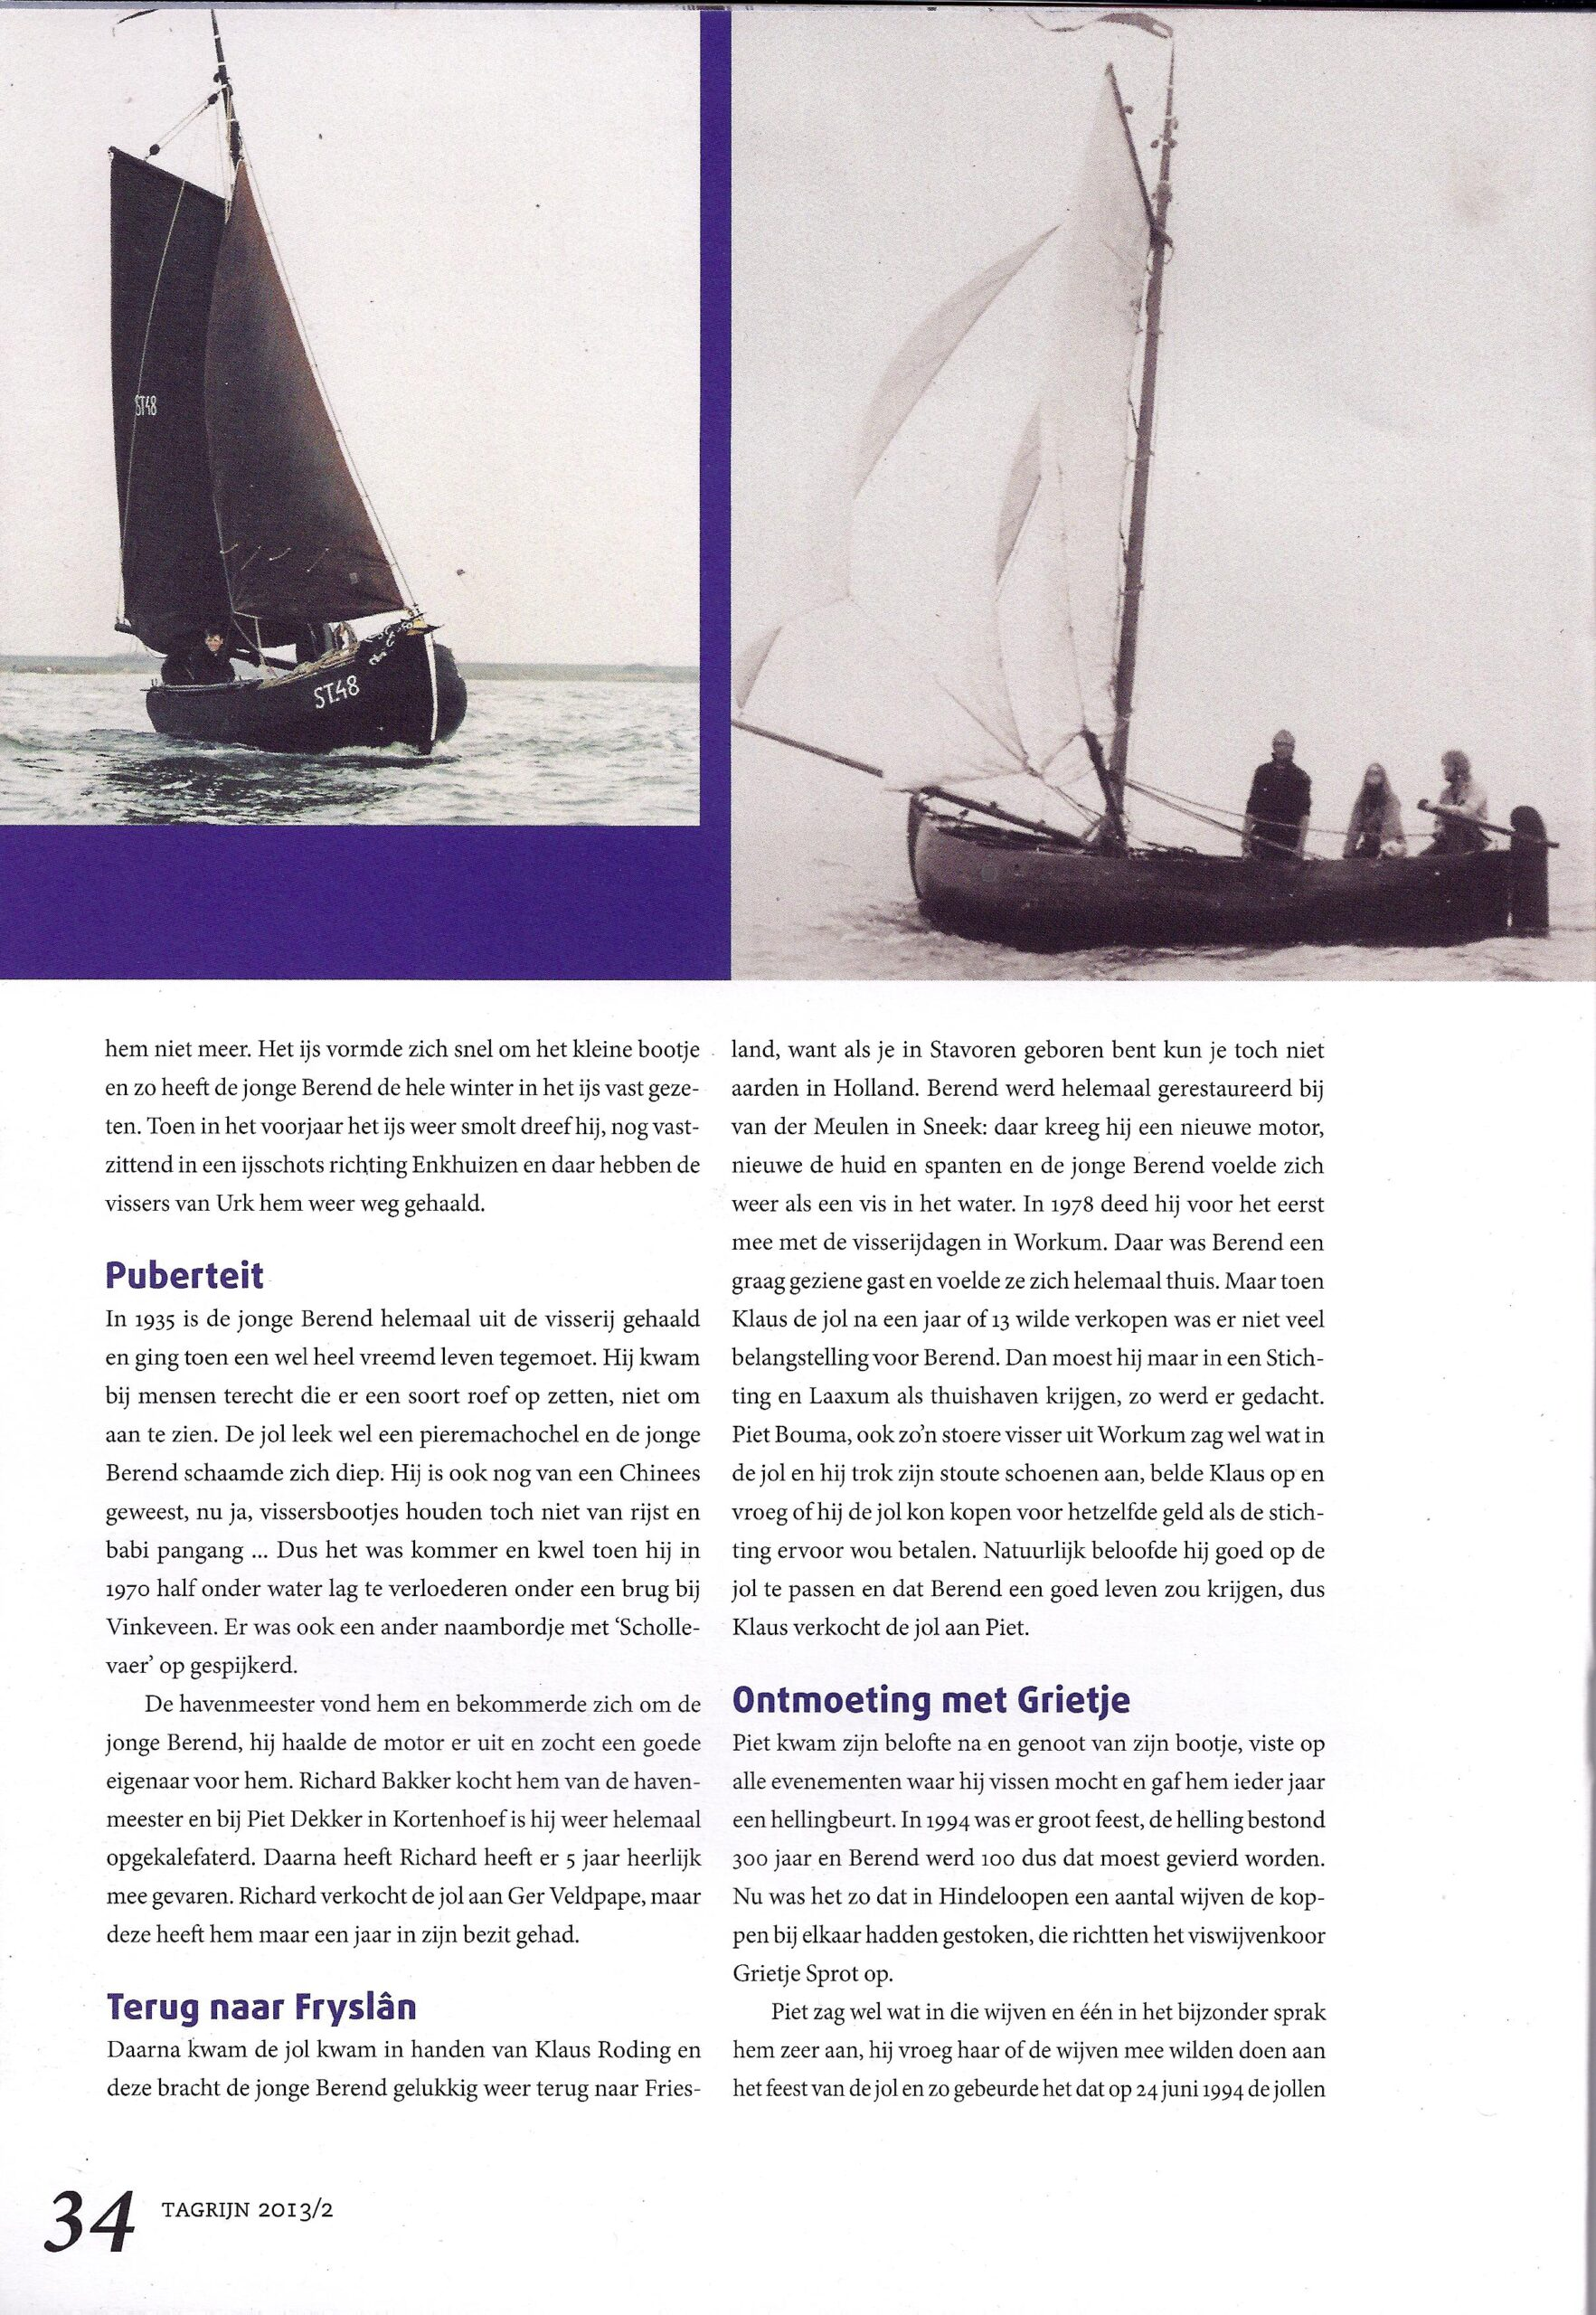 Tagrijn 2013 |tewaterlating ST48 | Pagina 3.